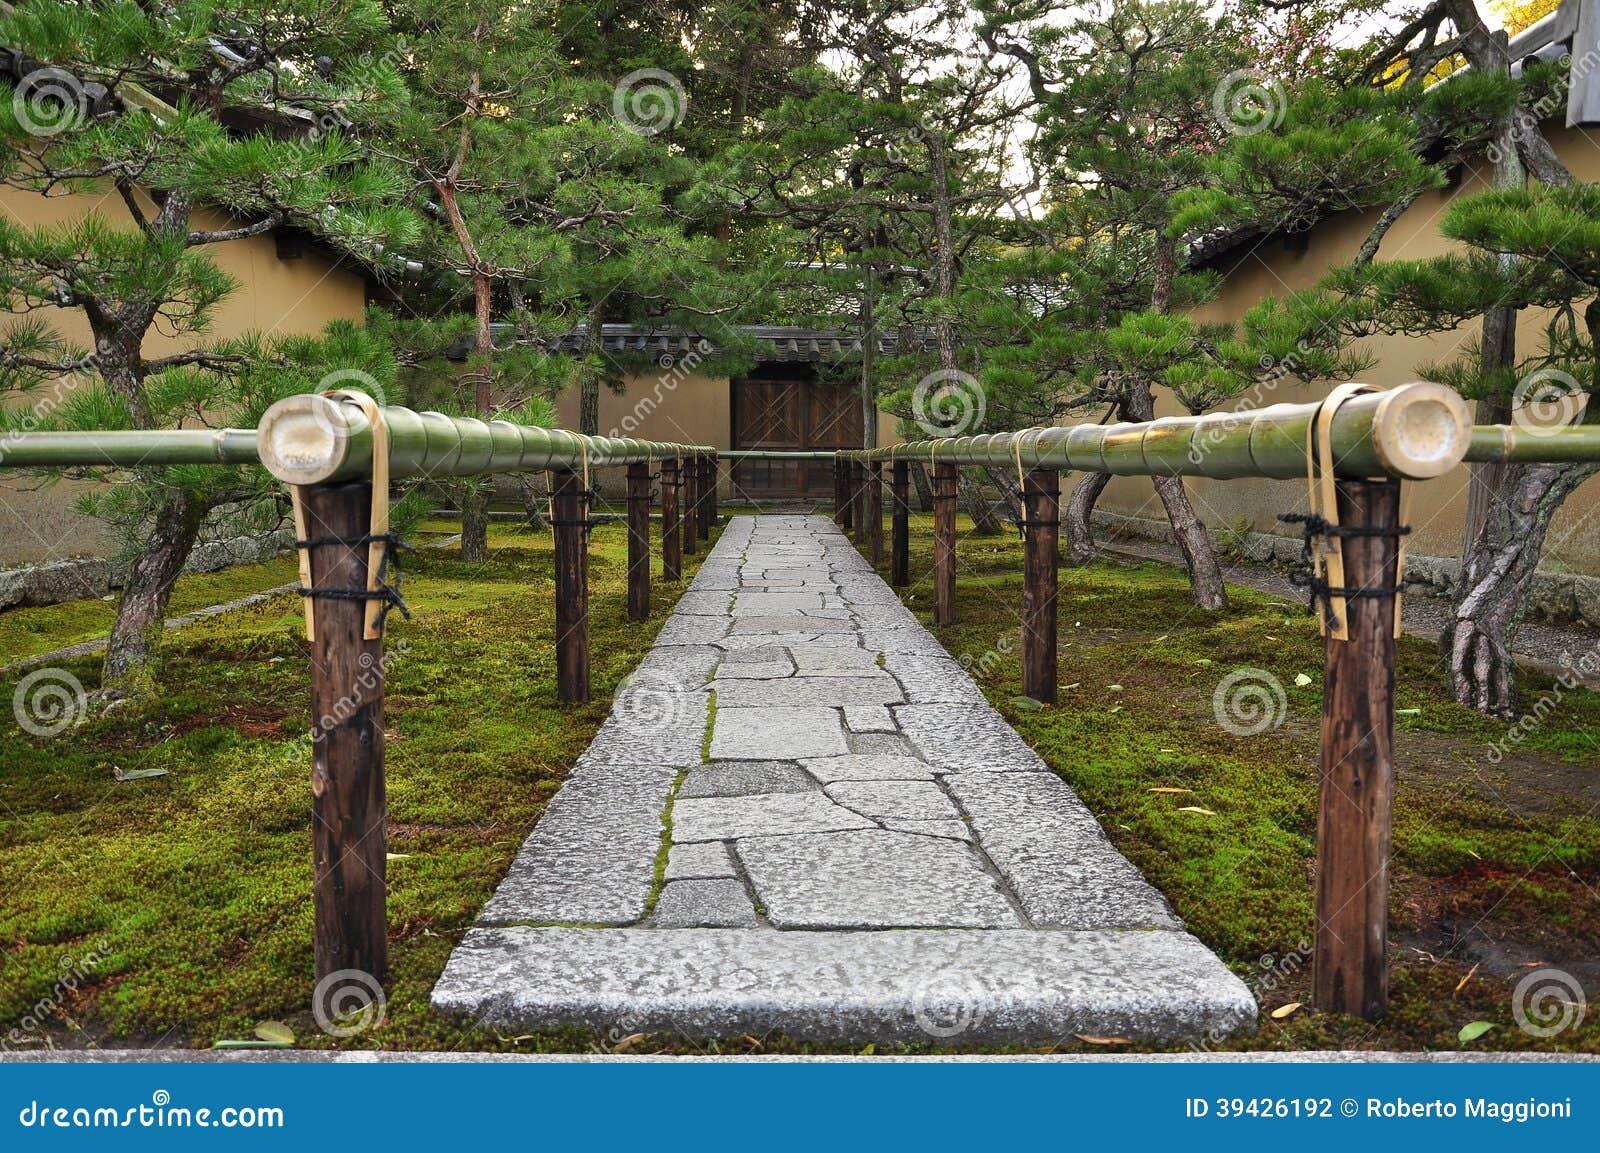 Japan Zen Temple Garden Entrance Stone Path Stock Photo Image Of